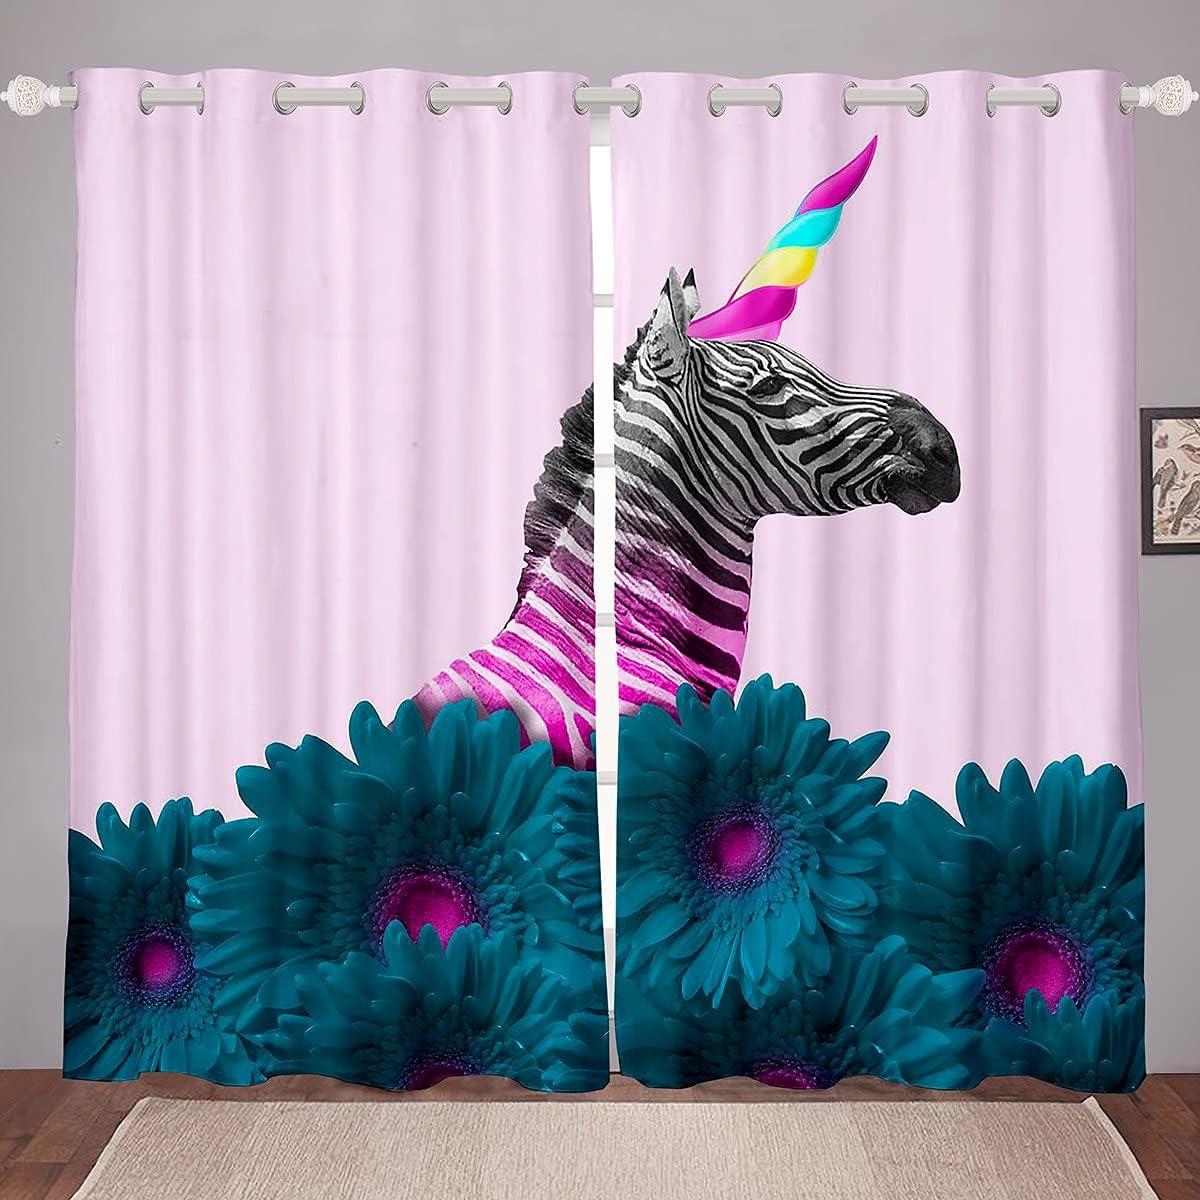 Erosebridal Girls Zebra Max 51% OFF Window Curtains 52